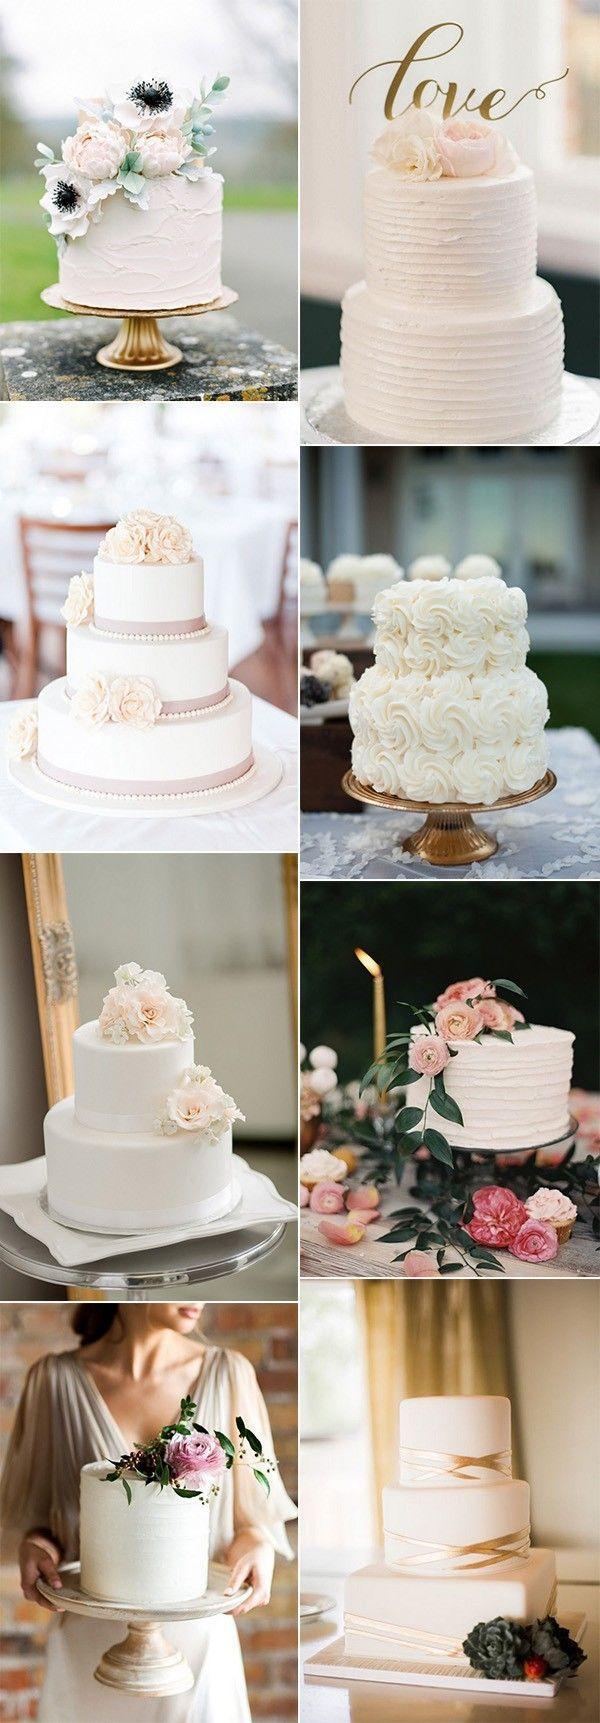 Trending simple but elegant wedding cakes weddingcakes future